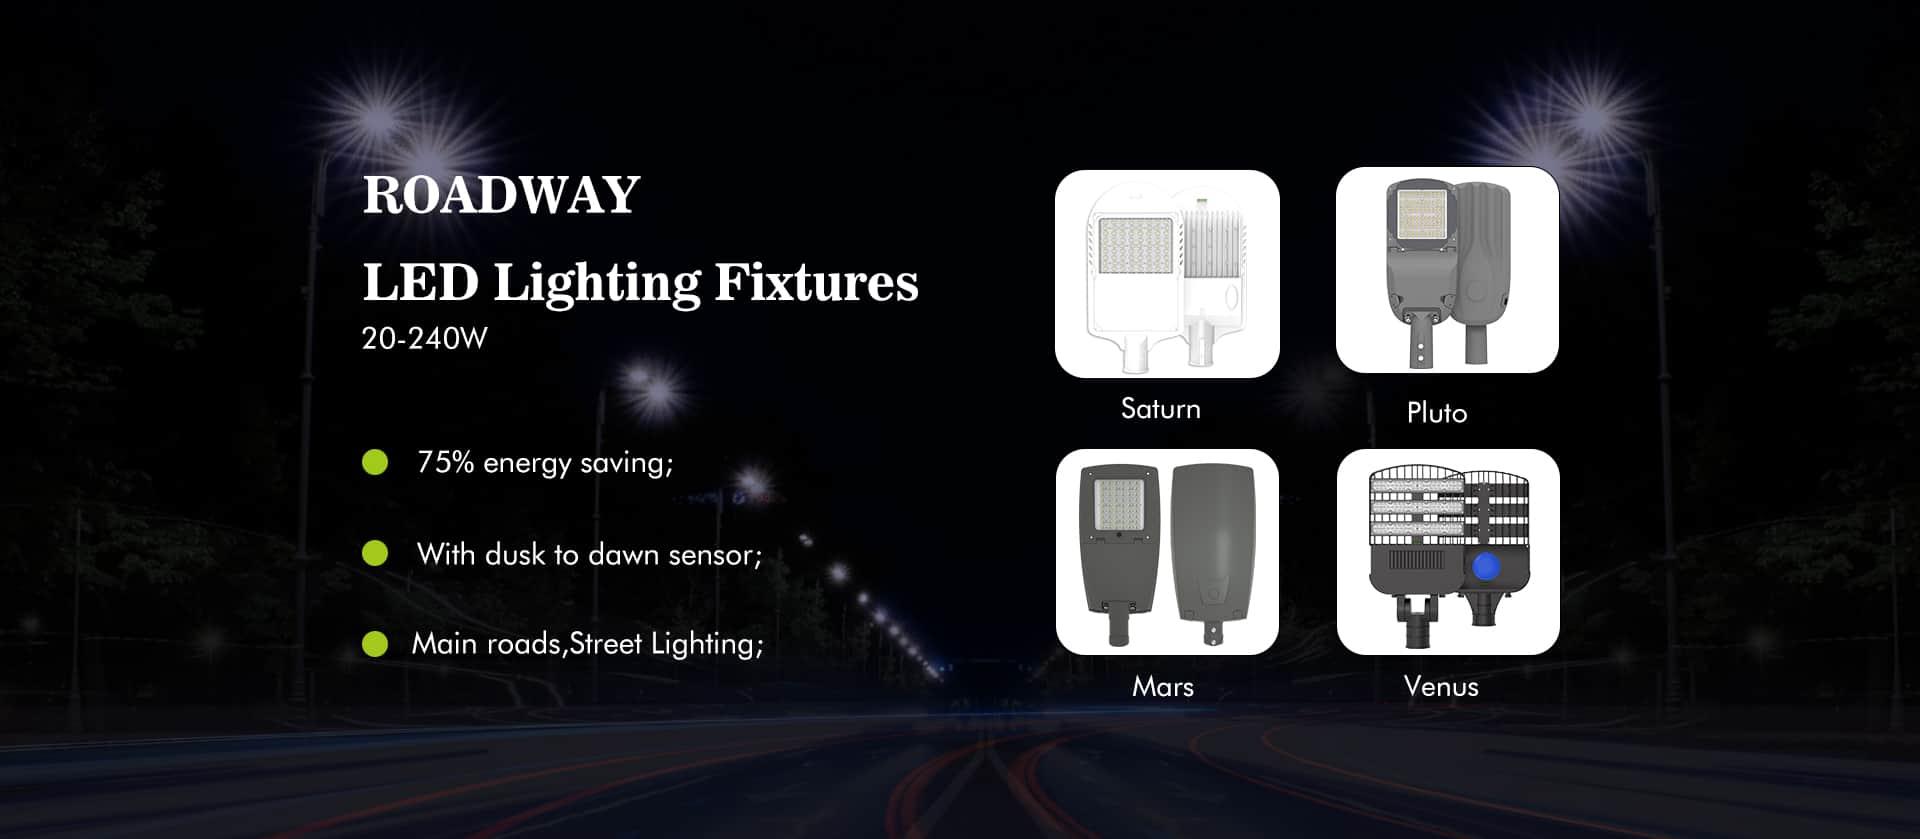 led roadway lighting fixtures